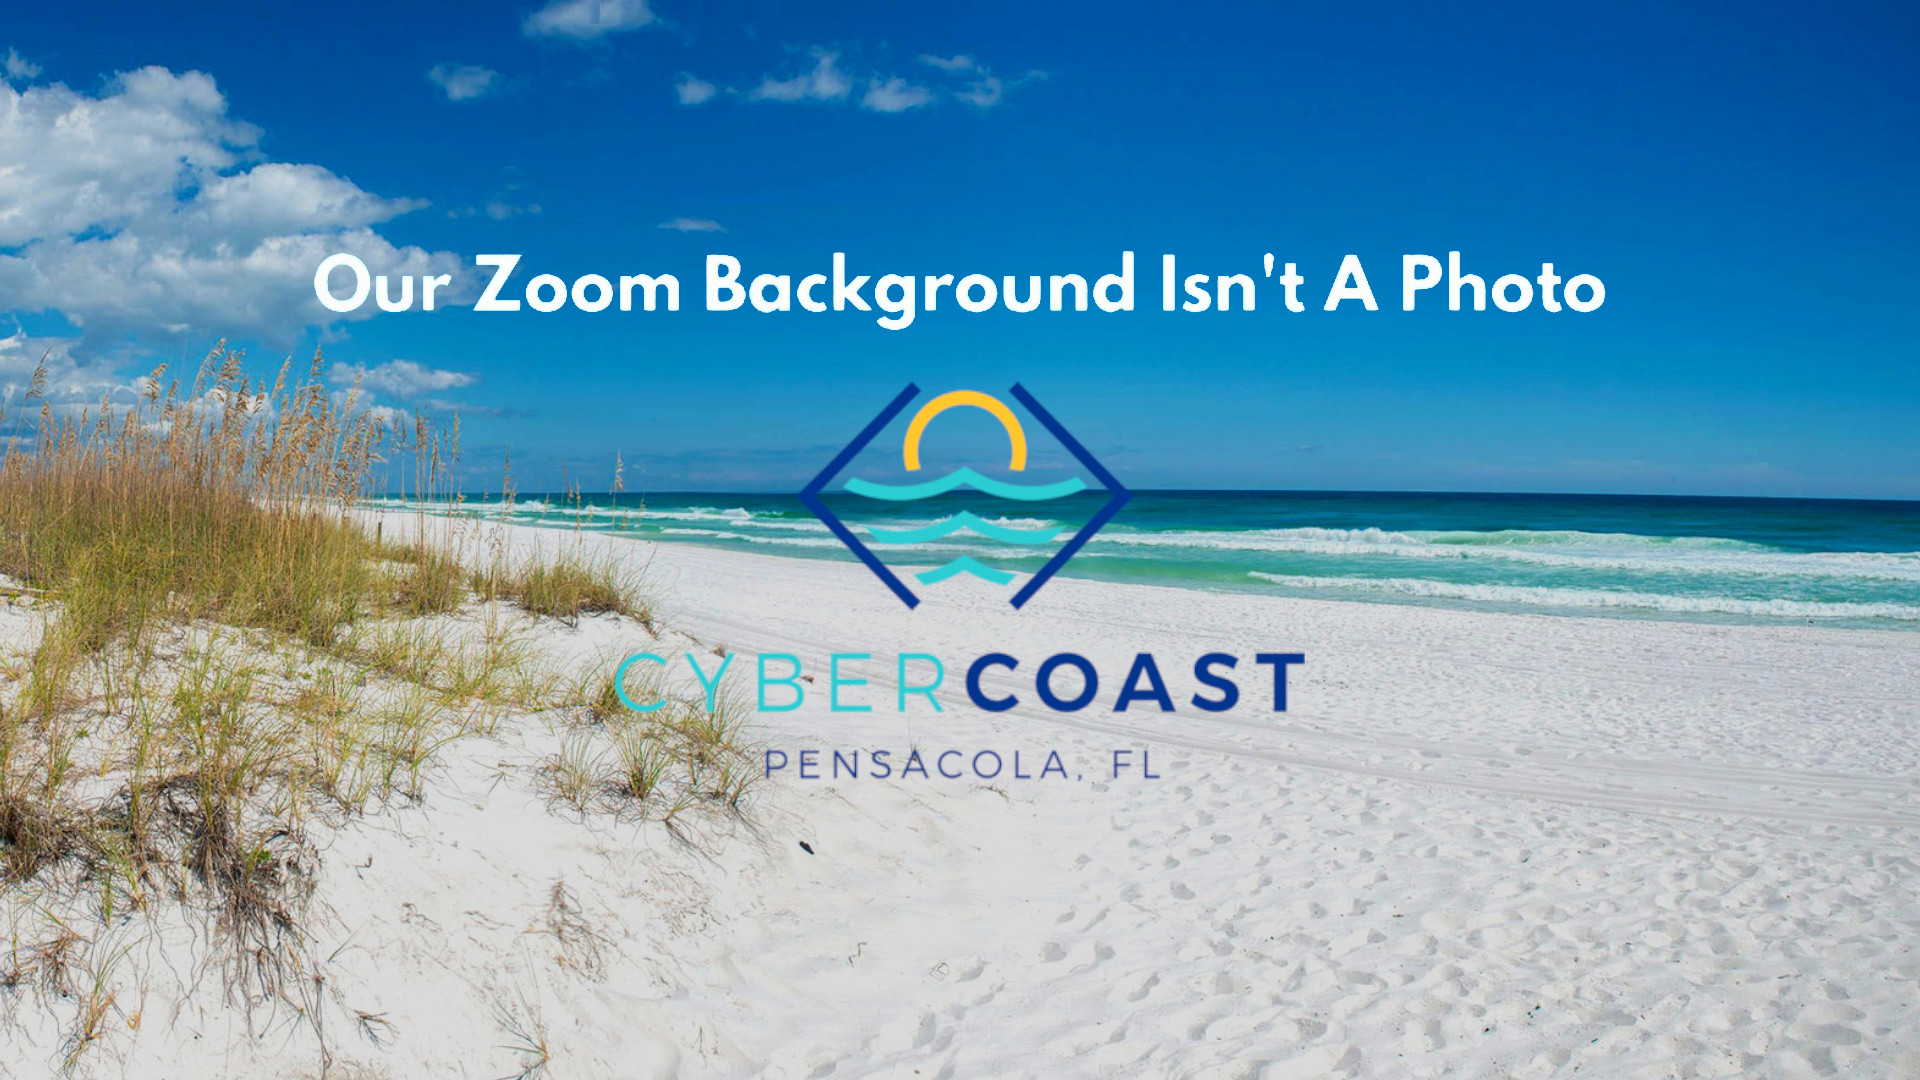 Remote Work in Cyber Coast Campaign, Pensacola